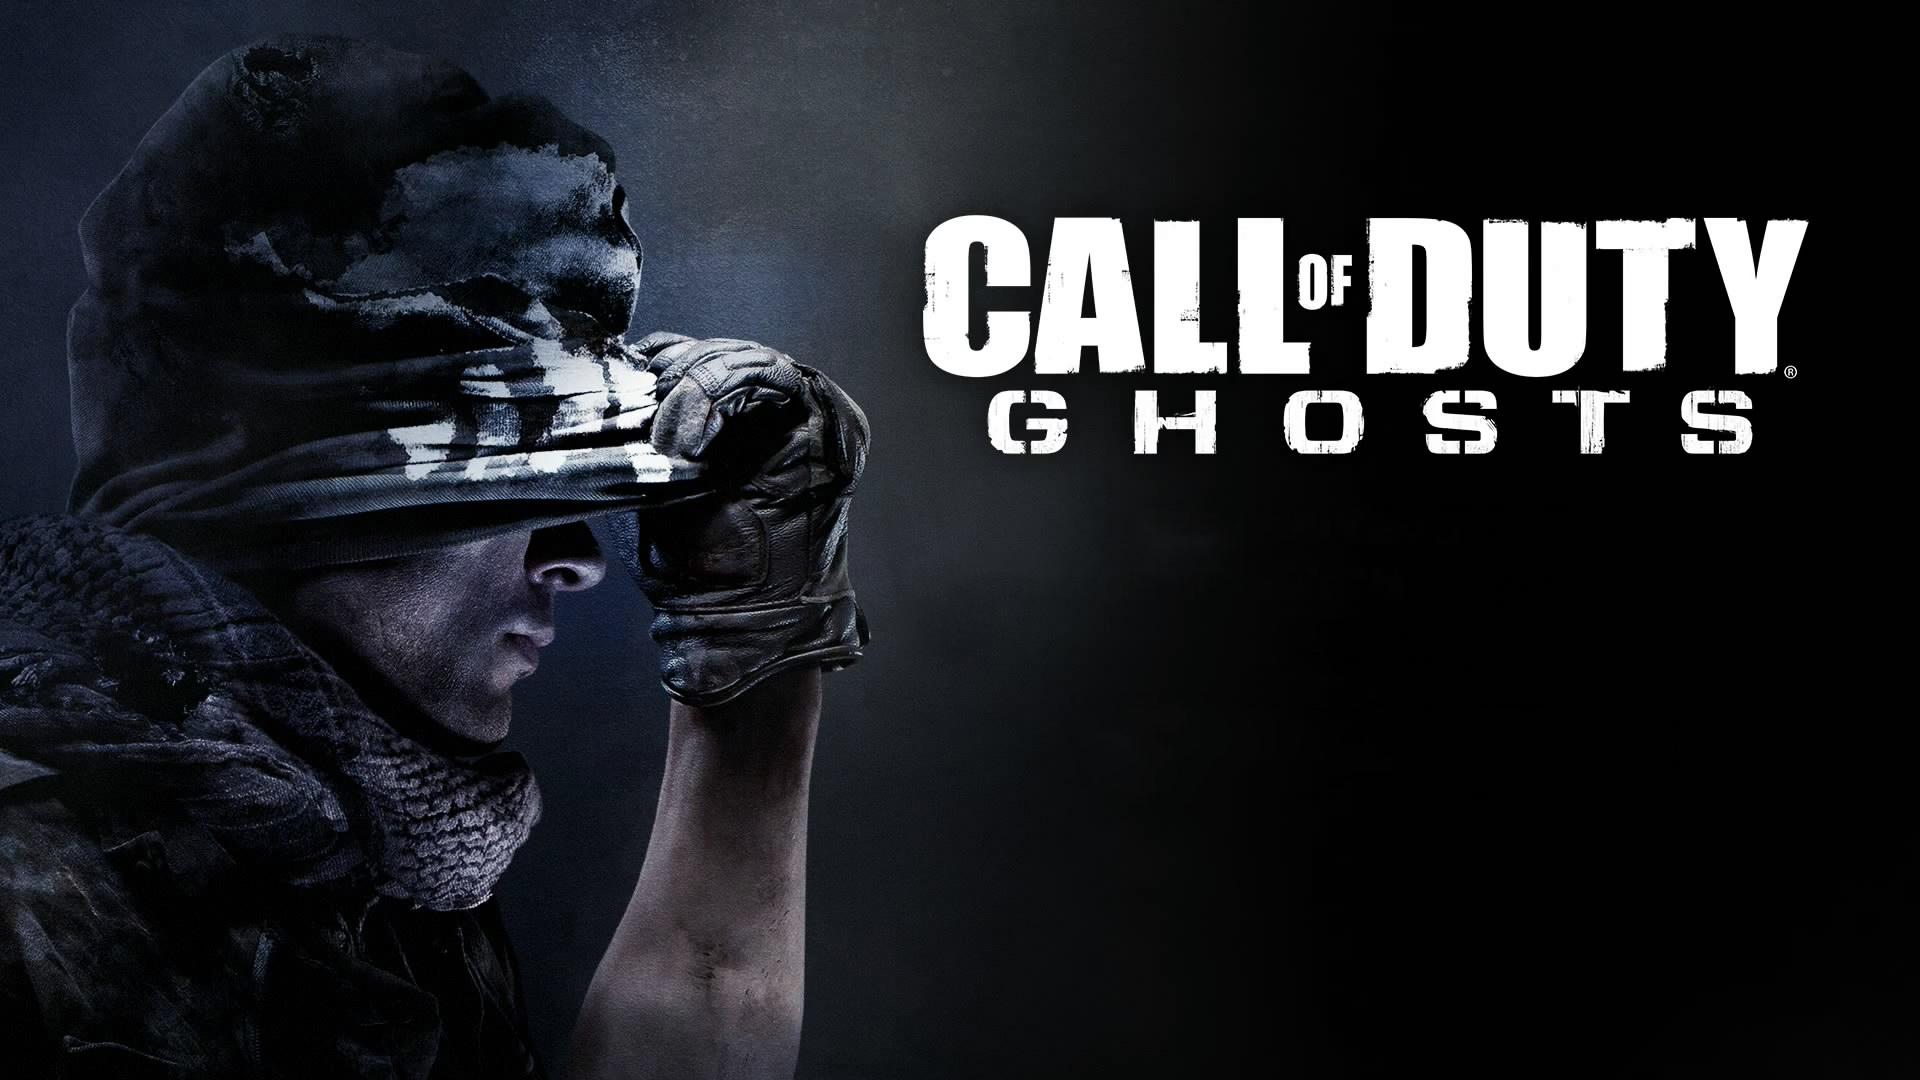 Call Of Duty Ghosts Wallpapers Hd   Taringa 1920x1080